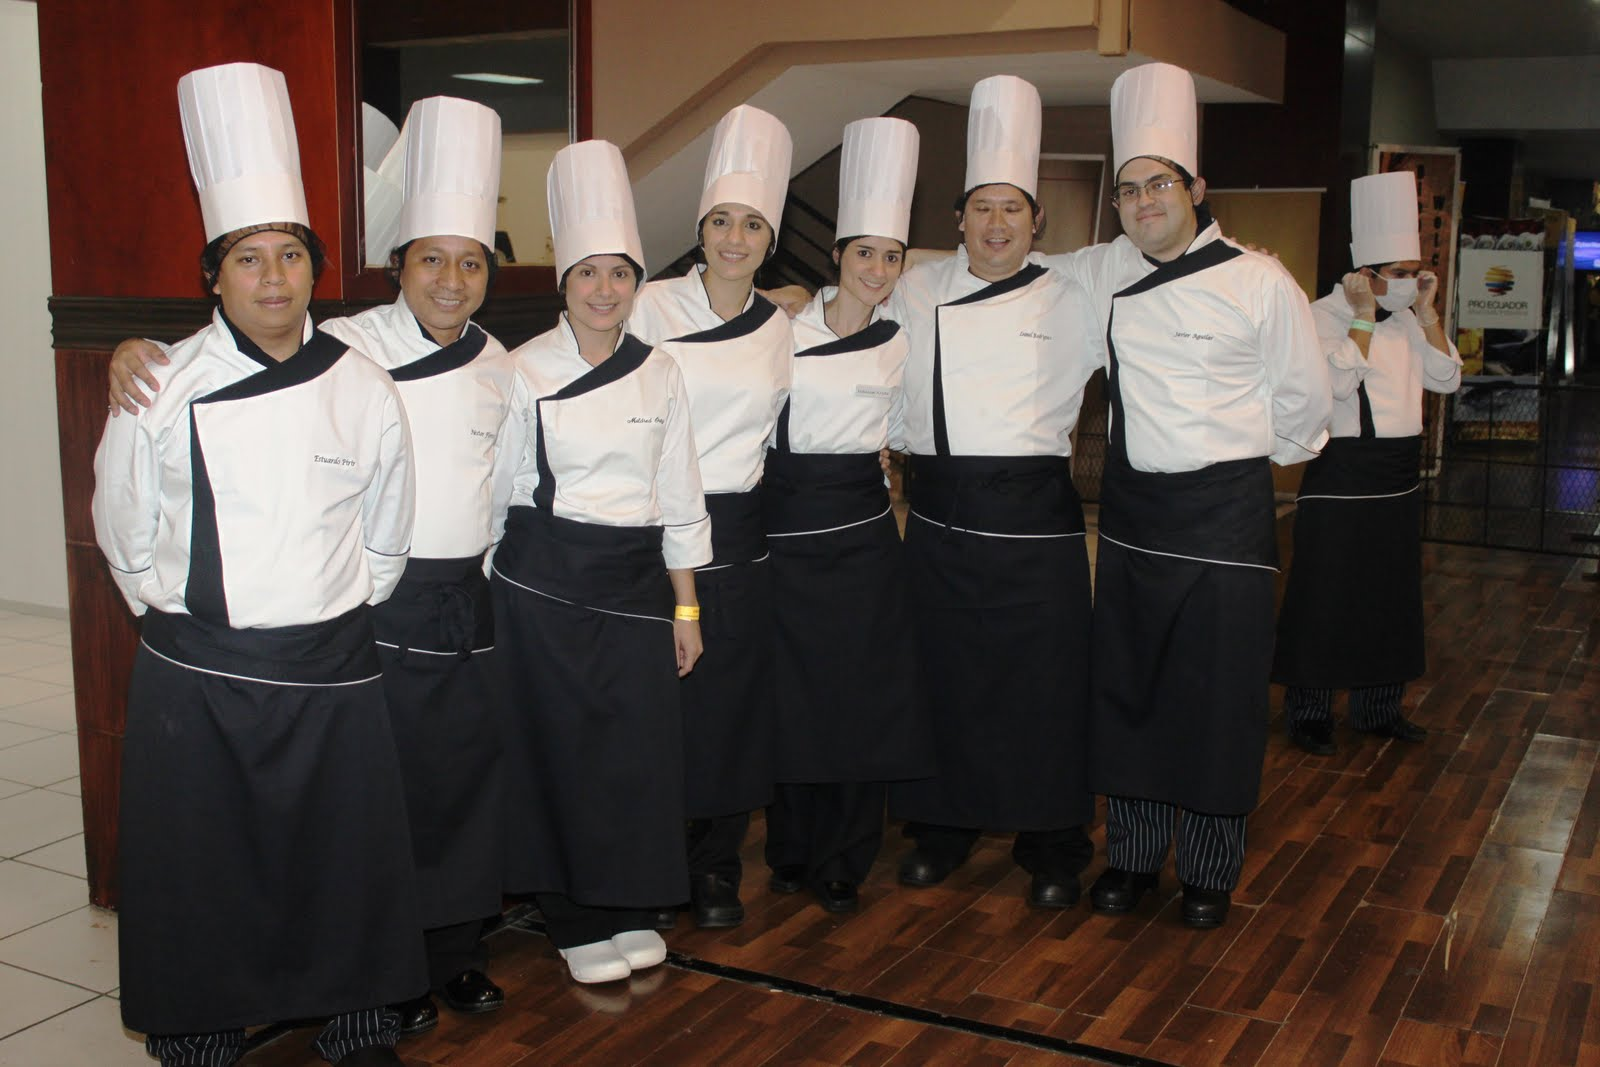 Nestor flores chef de san mart n bakery en gastron mico for Equipo para chef